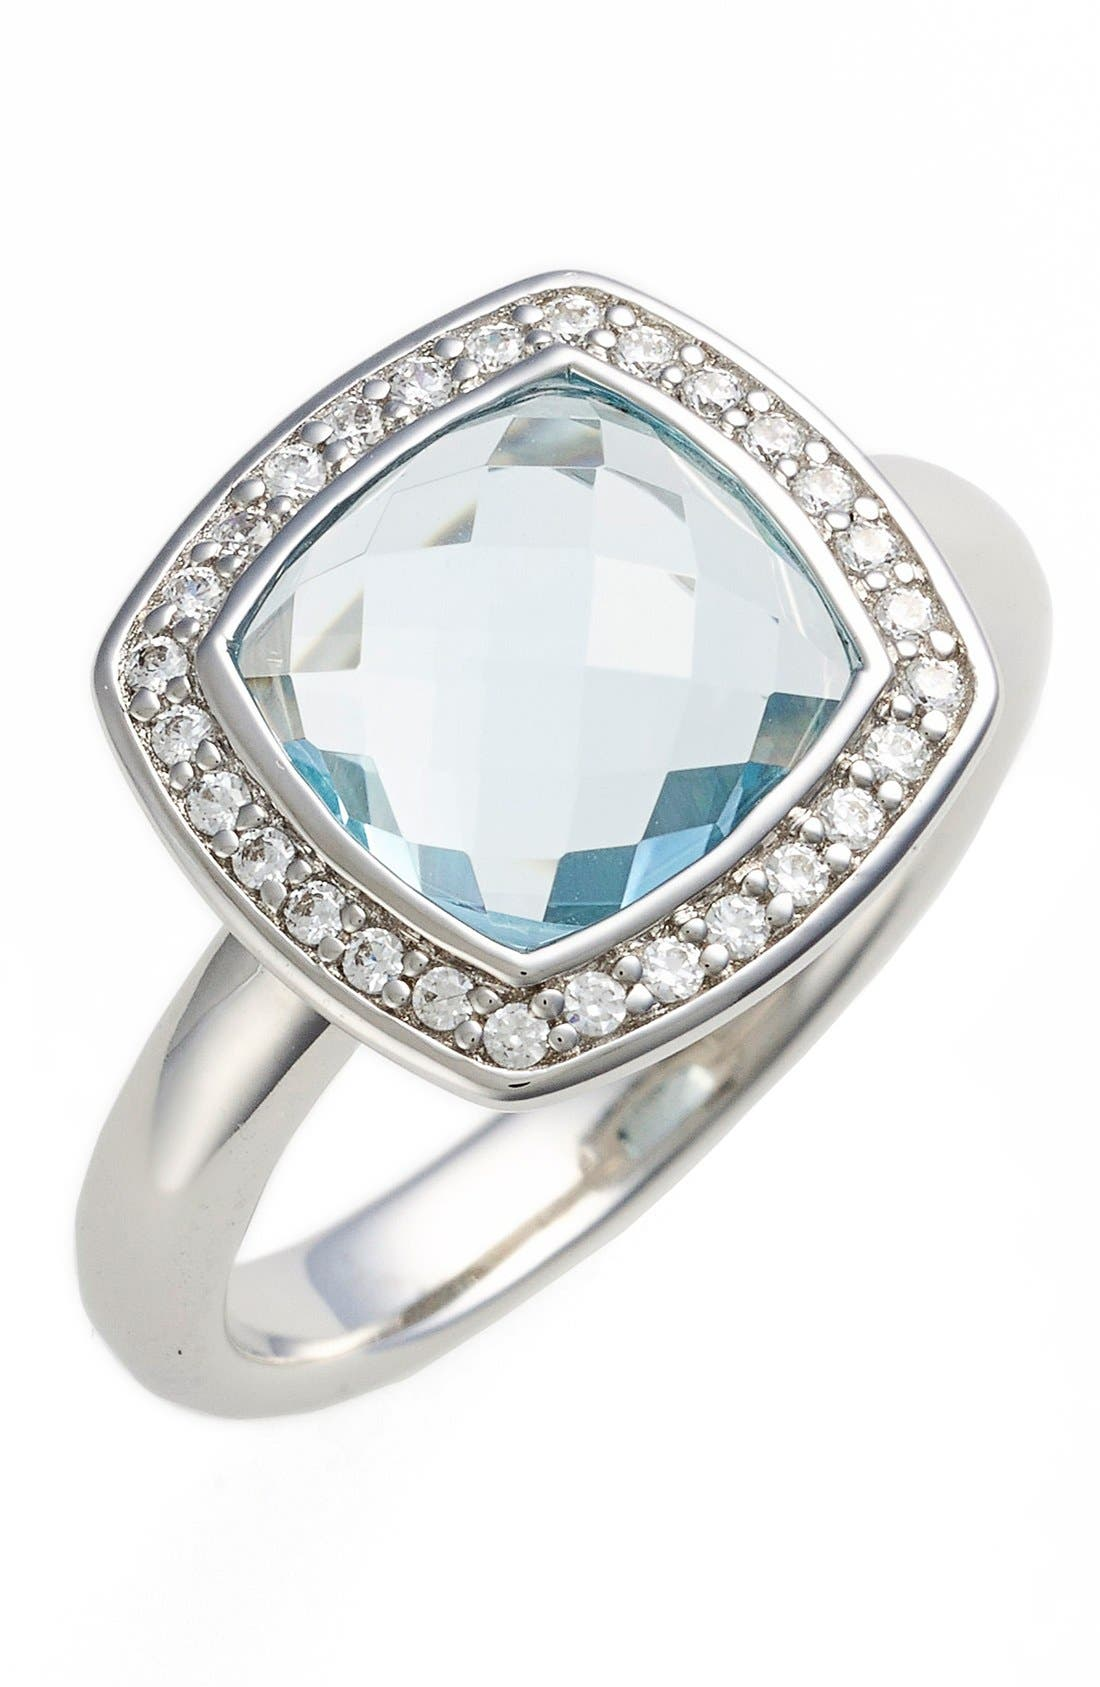 Alternate Image 1 Selected - Lafonn'Aria' Cushion Cut Ring